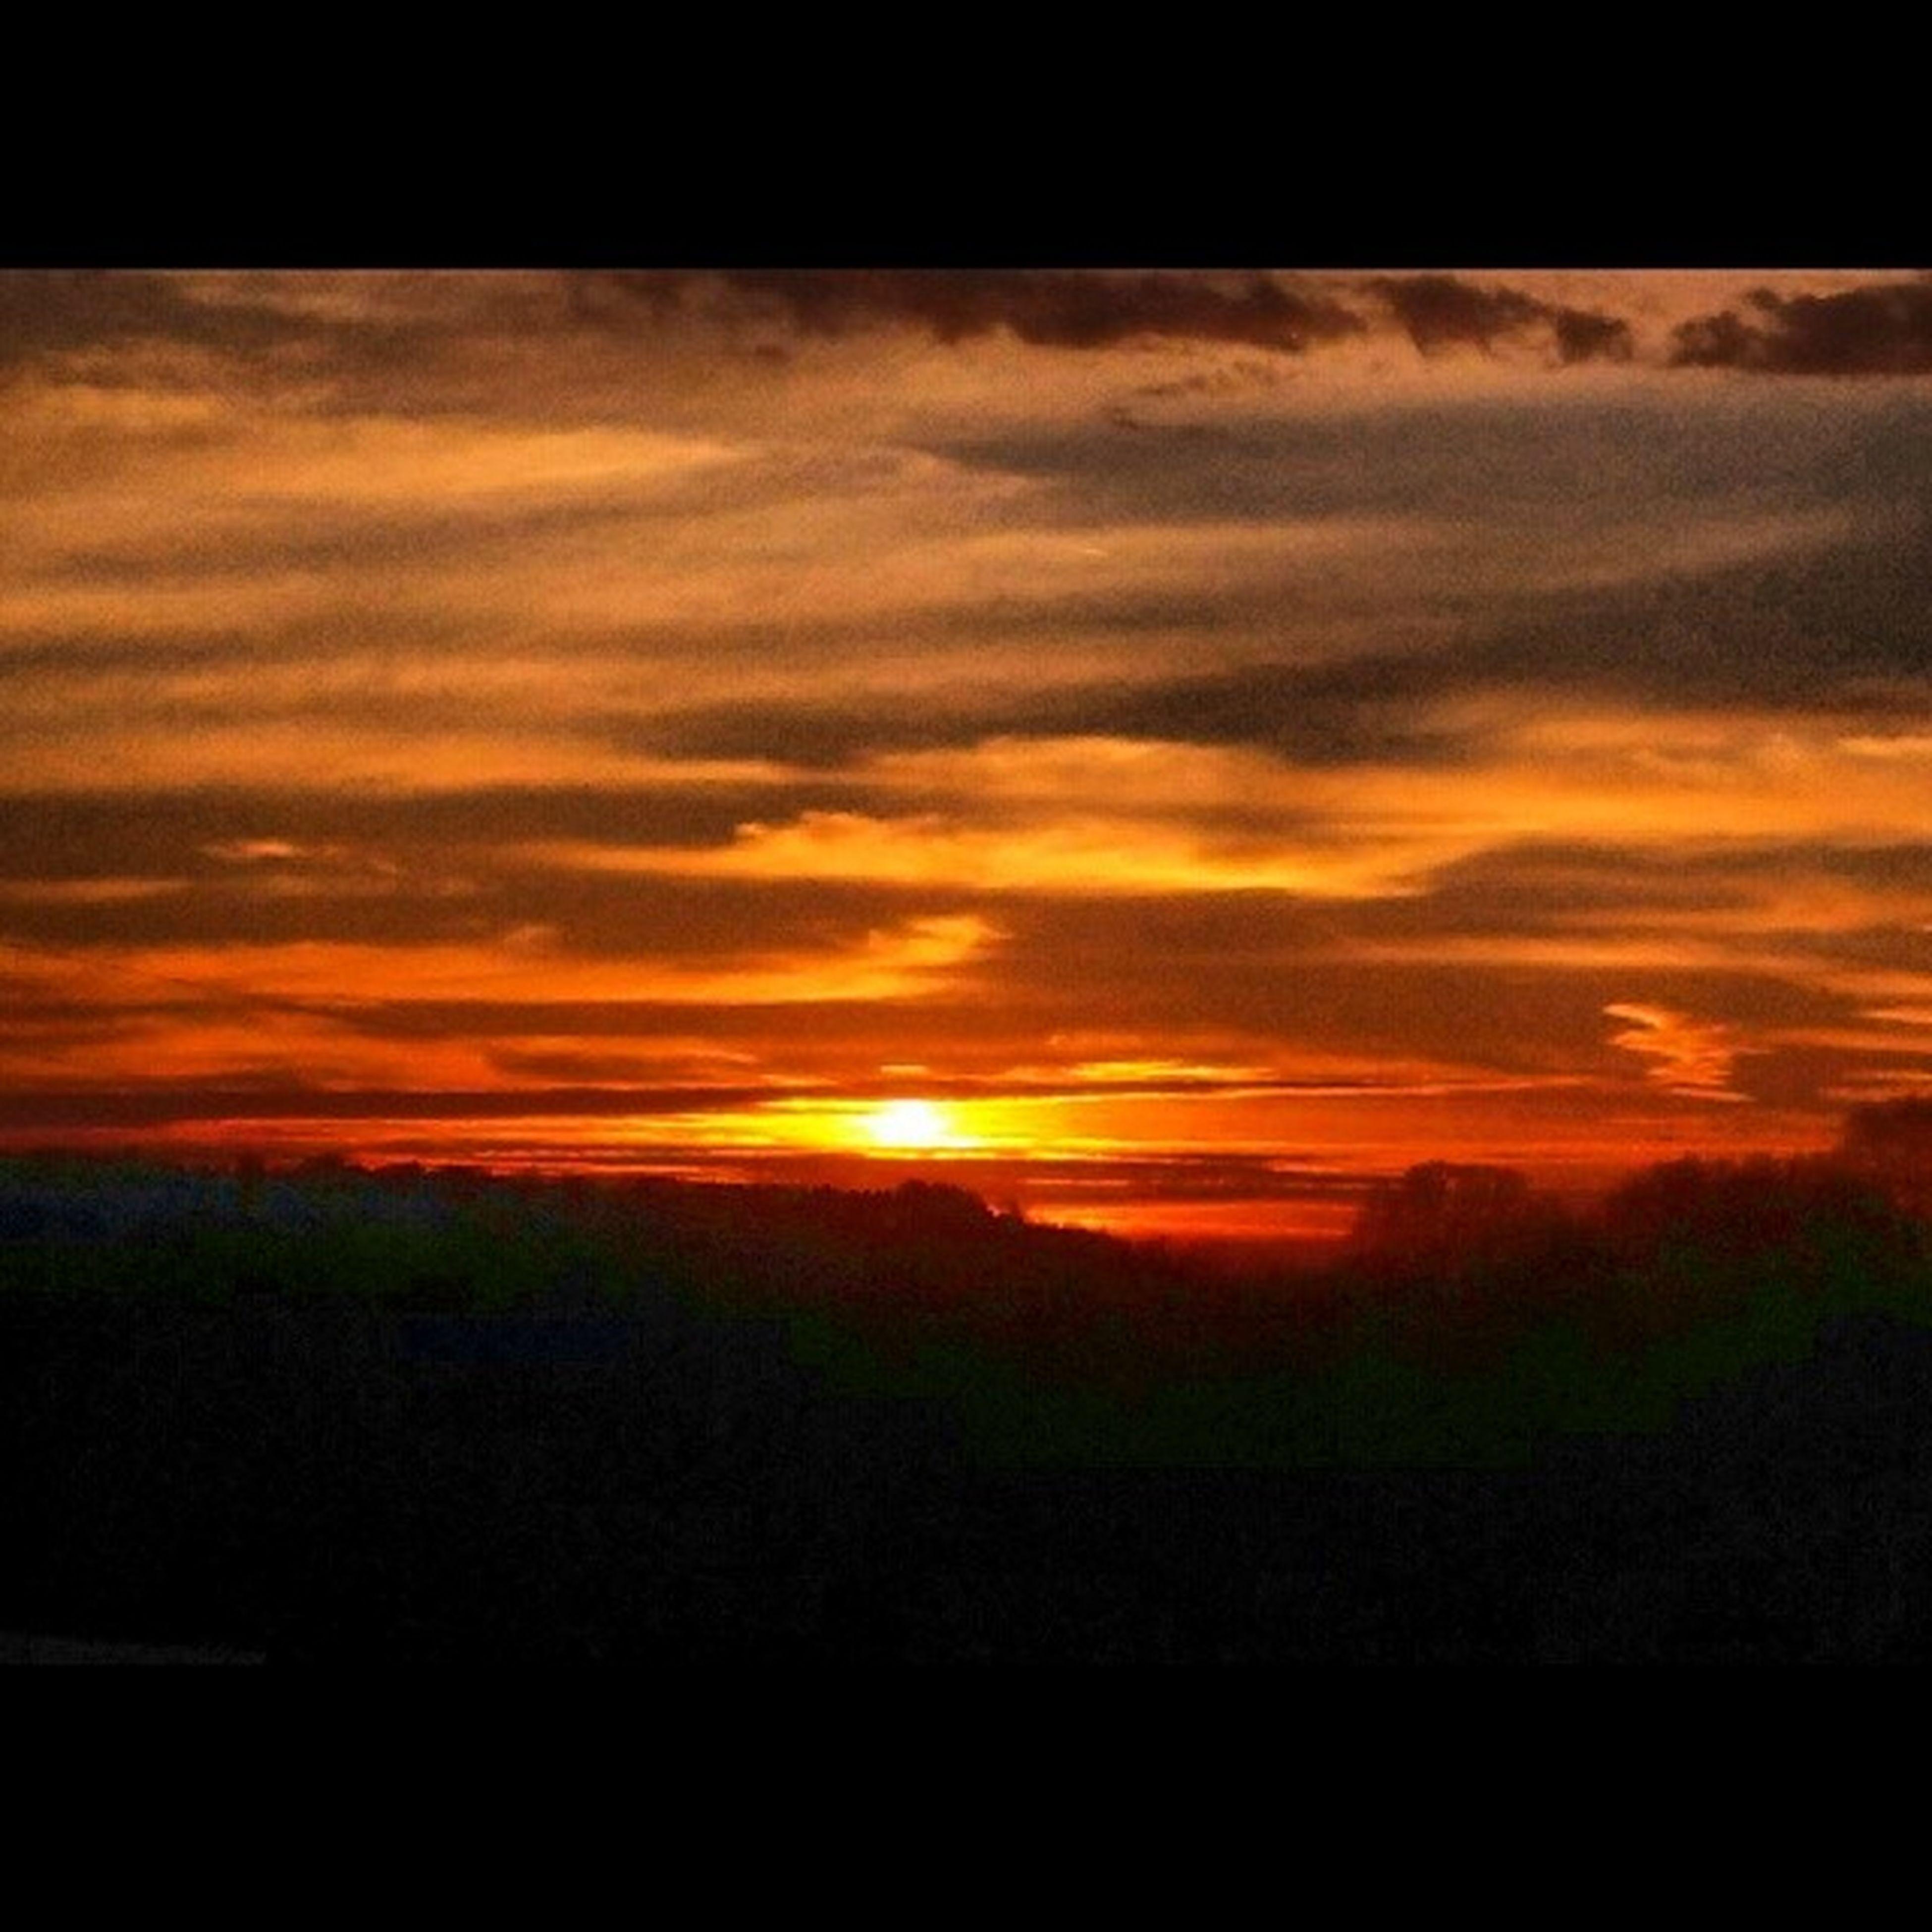 sunset, orange color, scenics, sky, beauty in nature, sun, tranquil scene, cloud - sky, tranquility, idyllic, silhouette, nature, dramatic sky, sunlight, landscape, sunbeam, cloud, cloudy, outdoors, no people